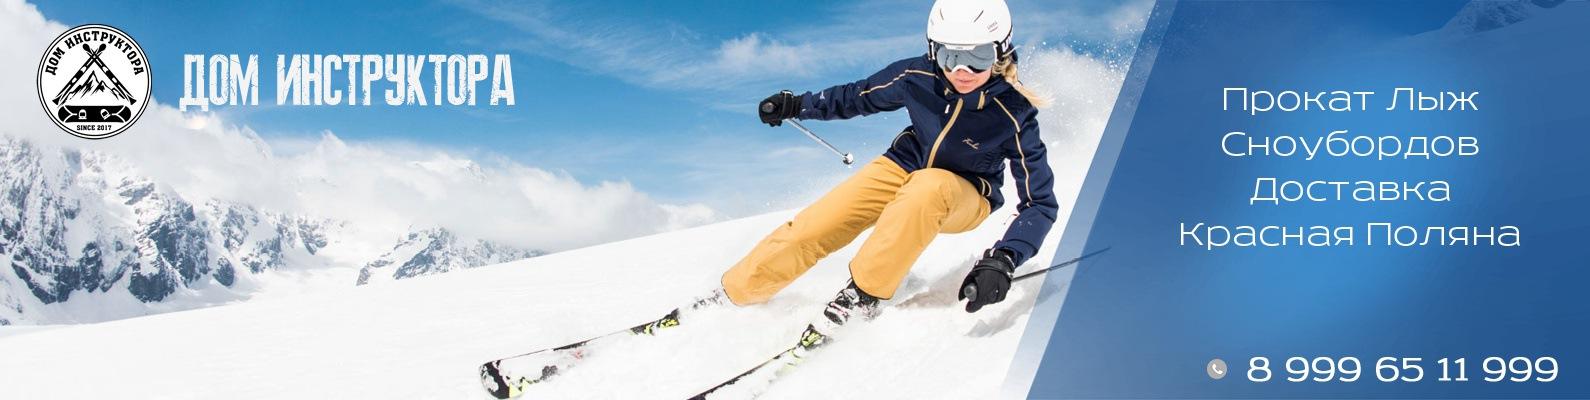 прокат лыж красная поляна 2015 телефоны